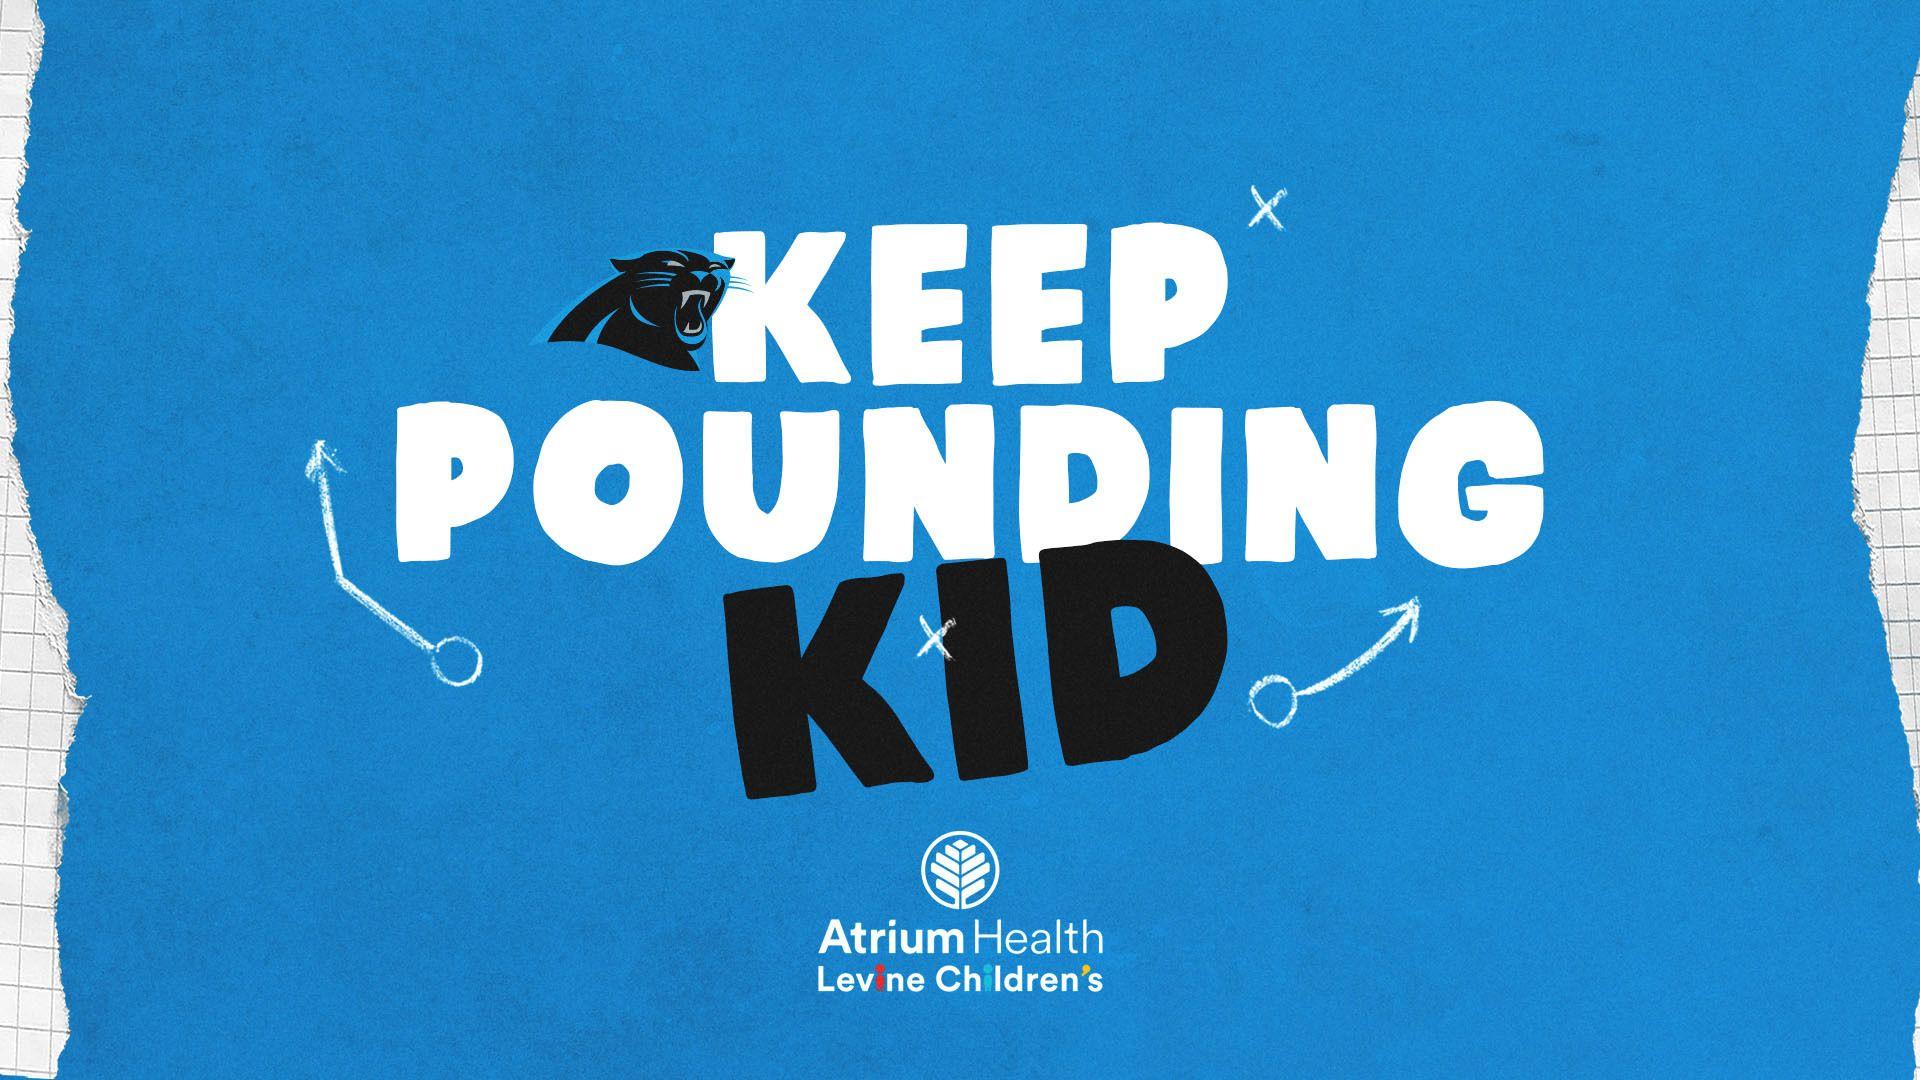 Keep Pounding Kid